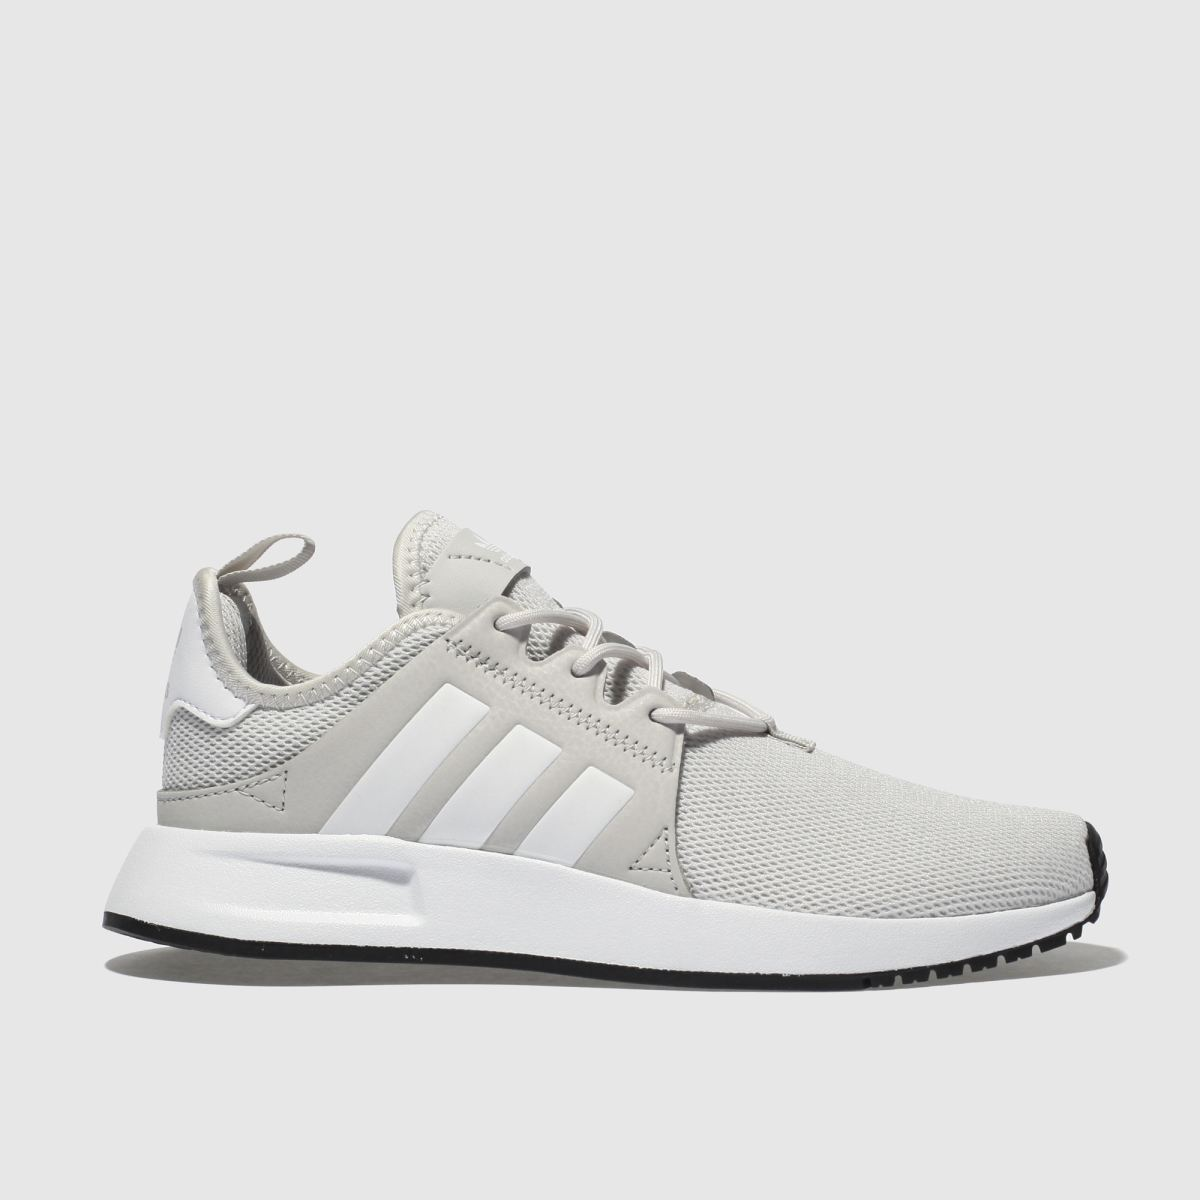 Adidas Light Grey X_plr Youth Trainers